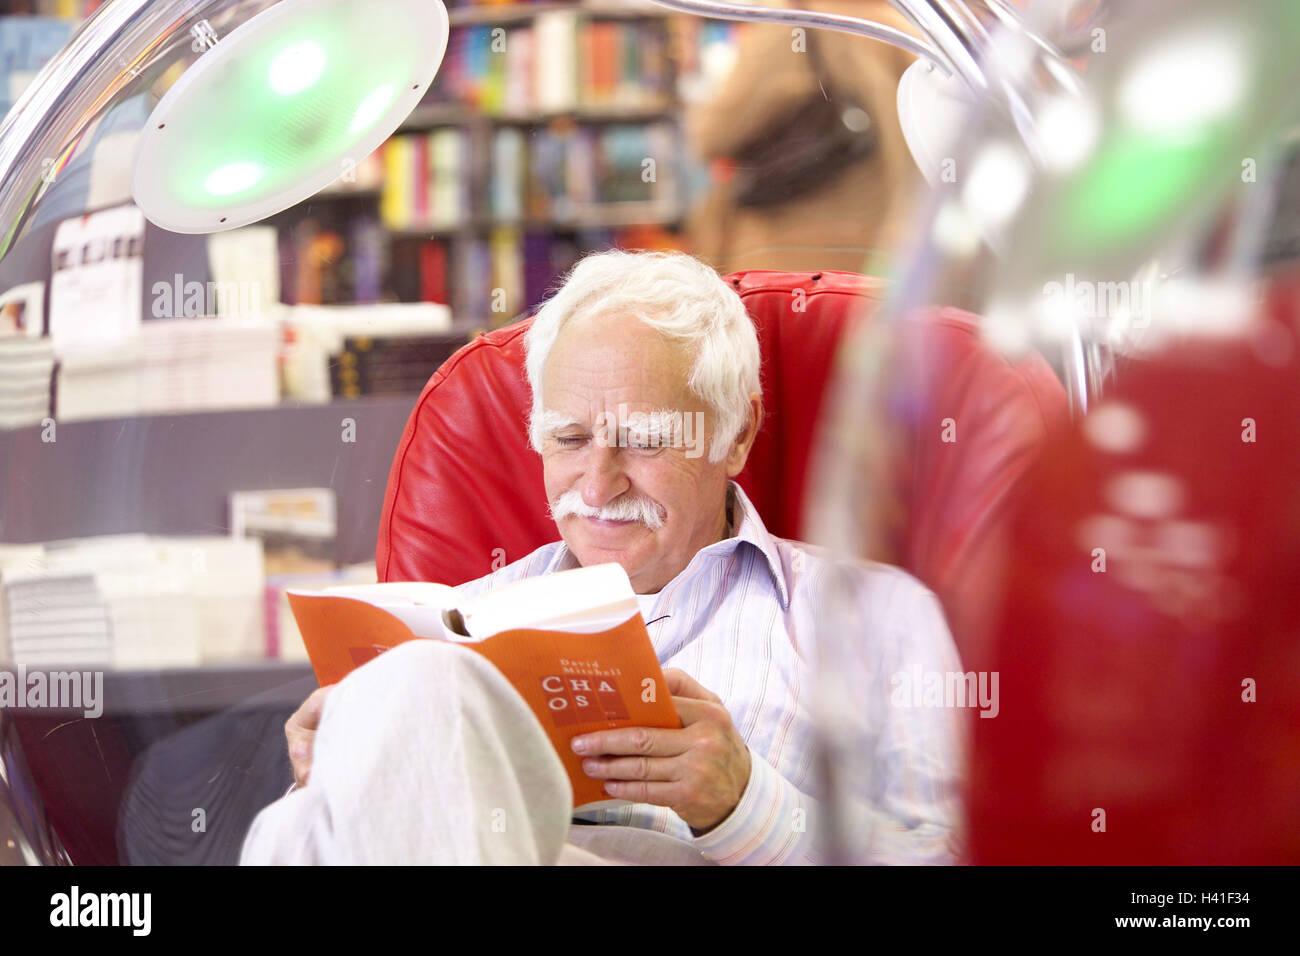 Leggere In Poltrona.Biblioteca Senior Sedersi Leggere Sfera Poltrona